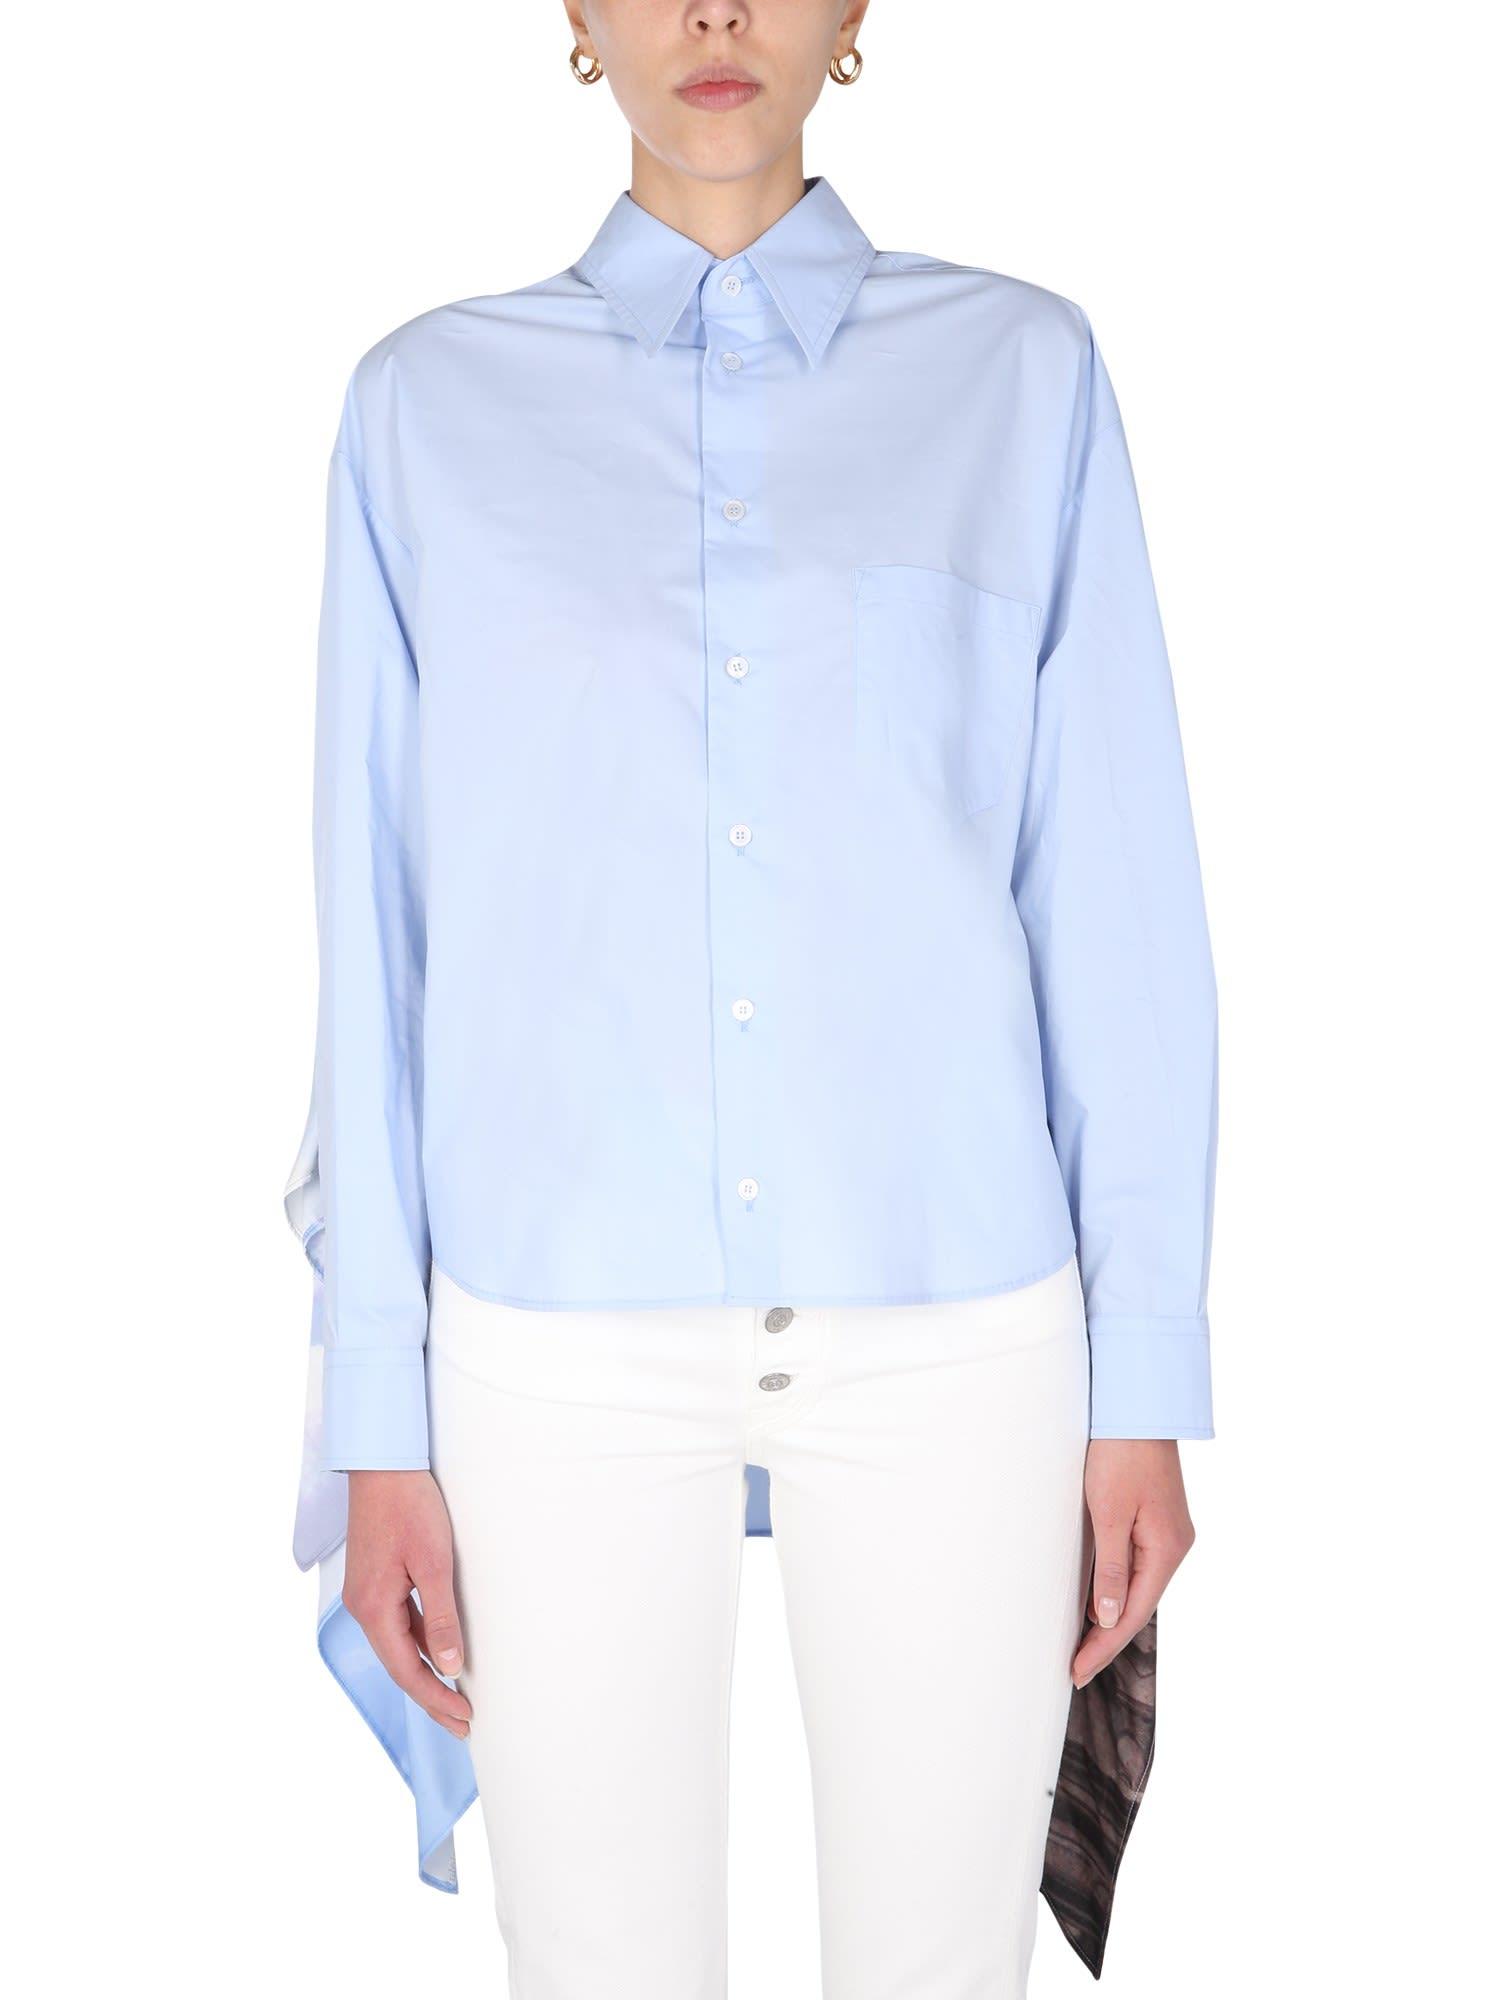 MM6 Maison Margiela Sky Scarf Shirt